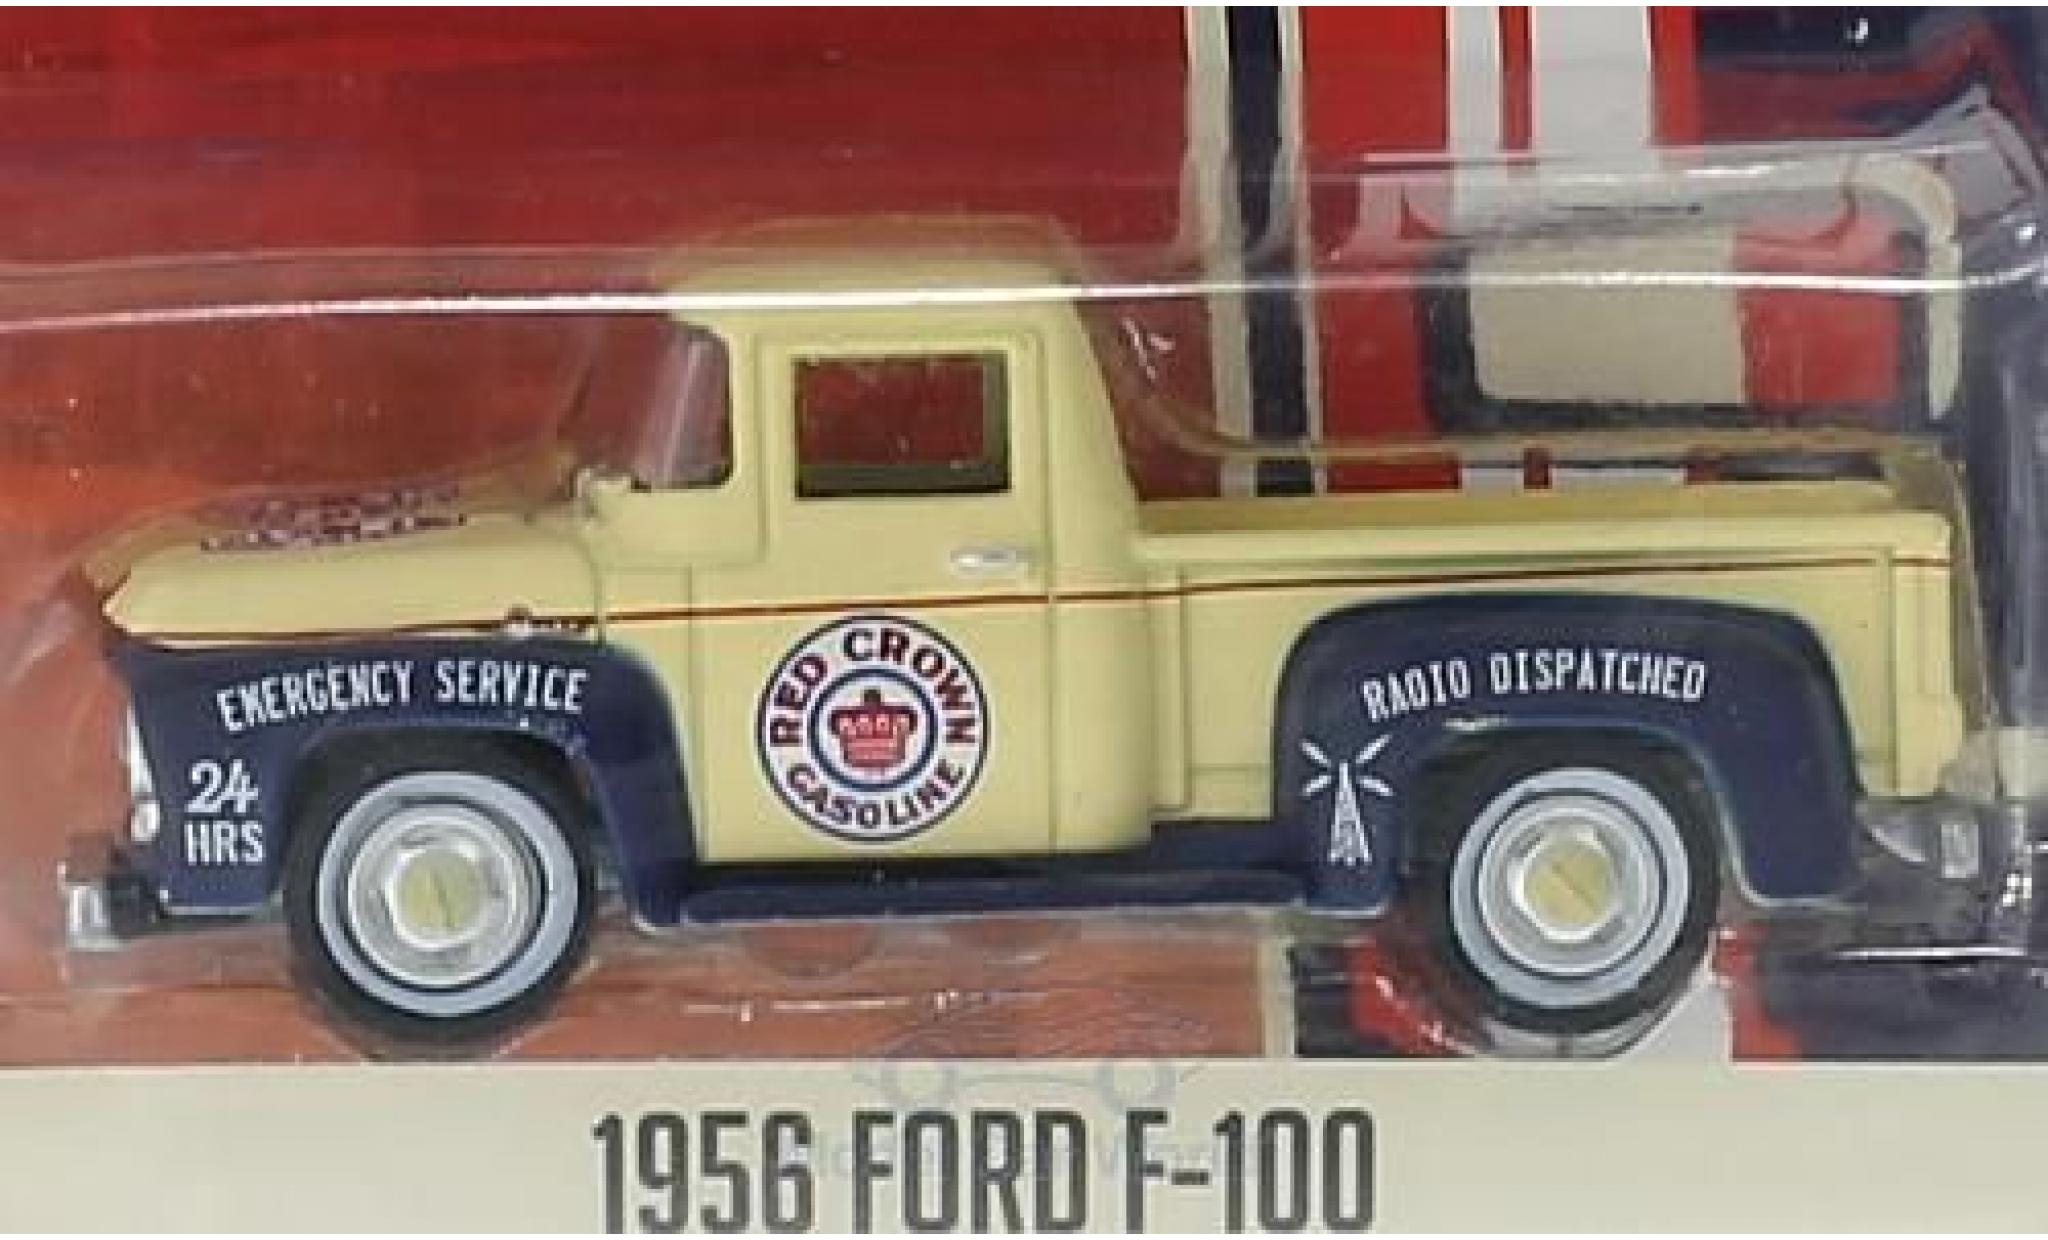 Ford F-1 1/64 Greenlight 00 Red Crown Gasoline 1956 Running On Empty Series 1 ohne Vitrine